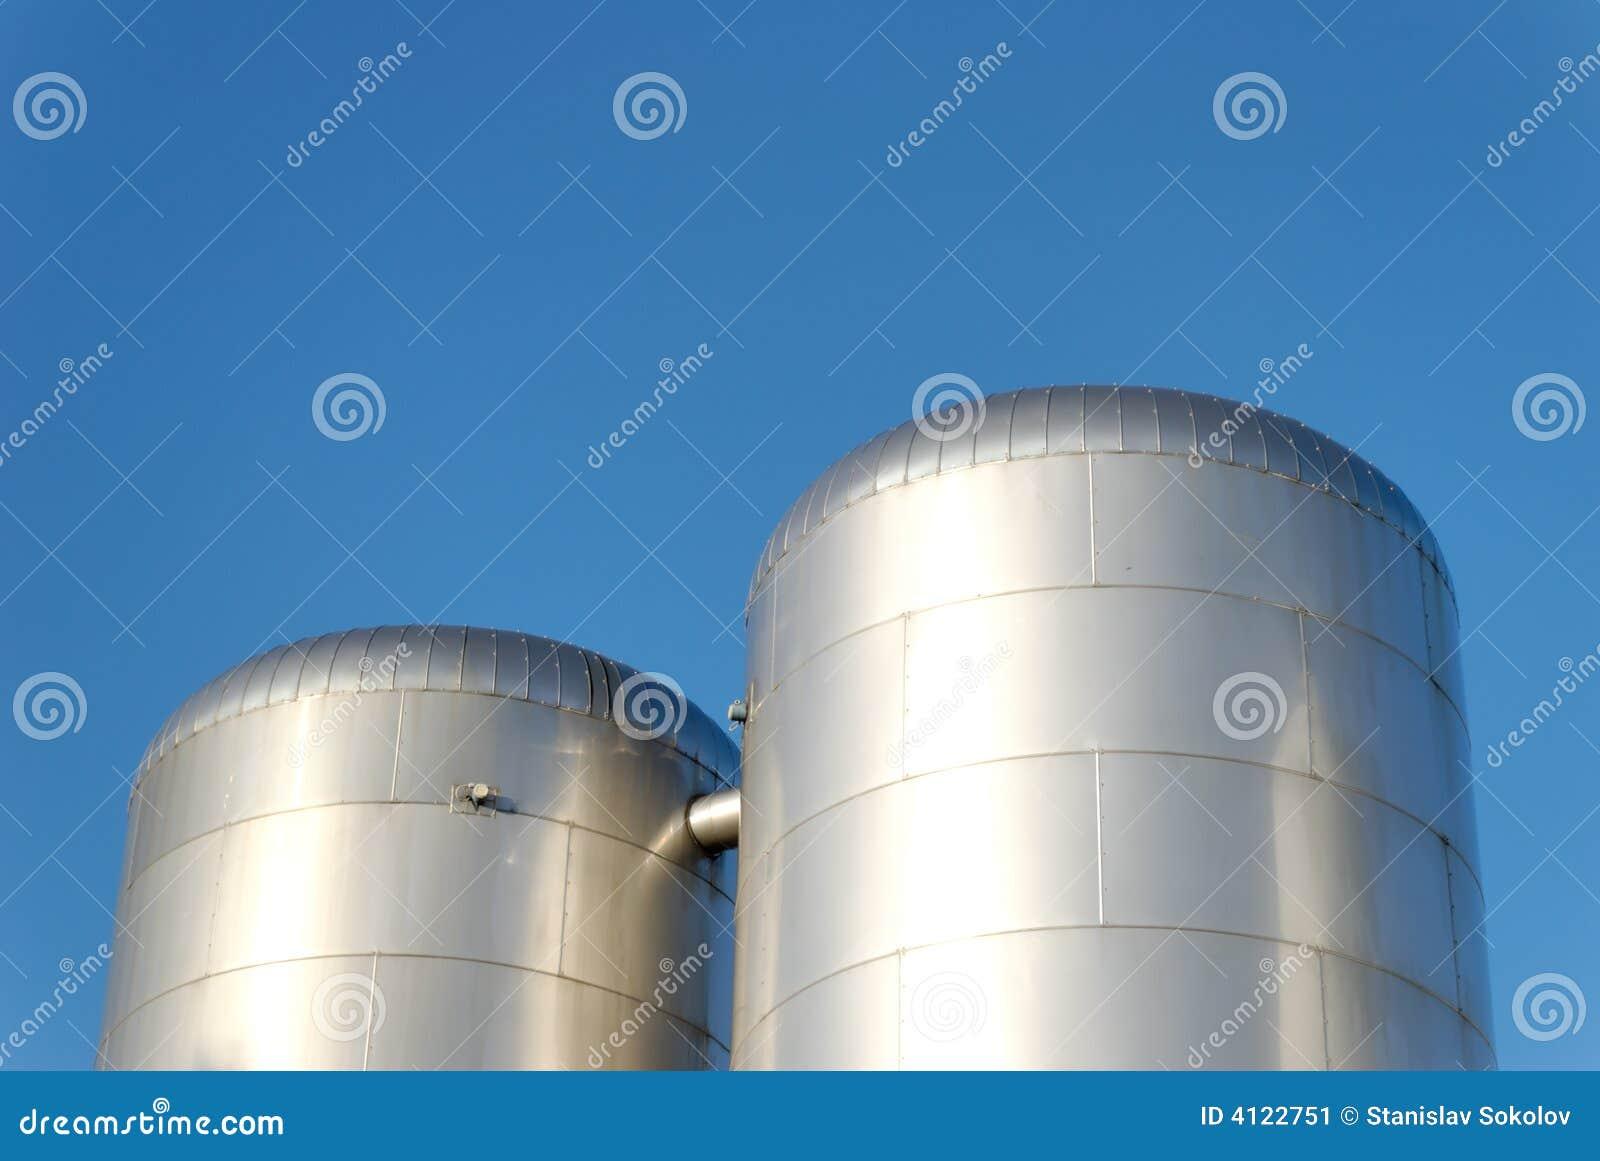 CO2 Vorratsbehälter